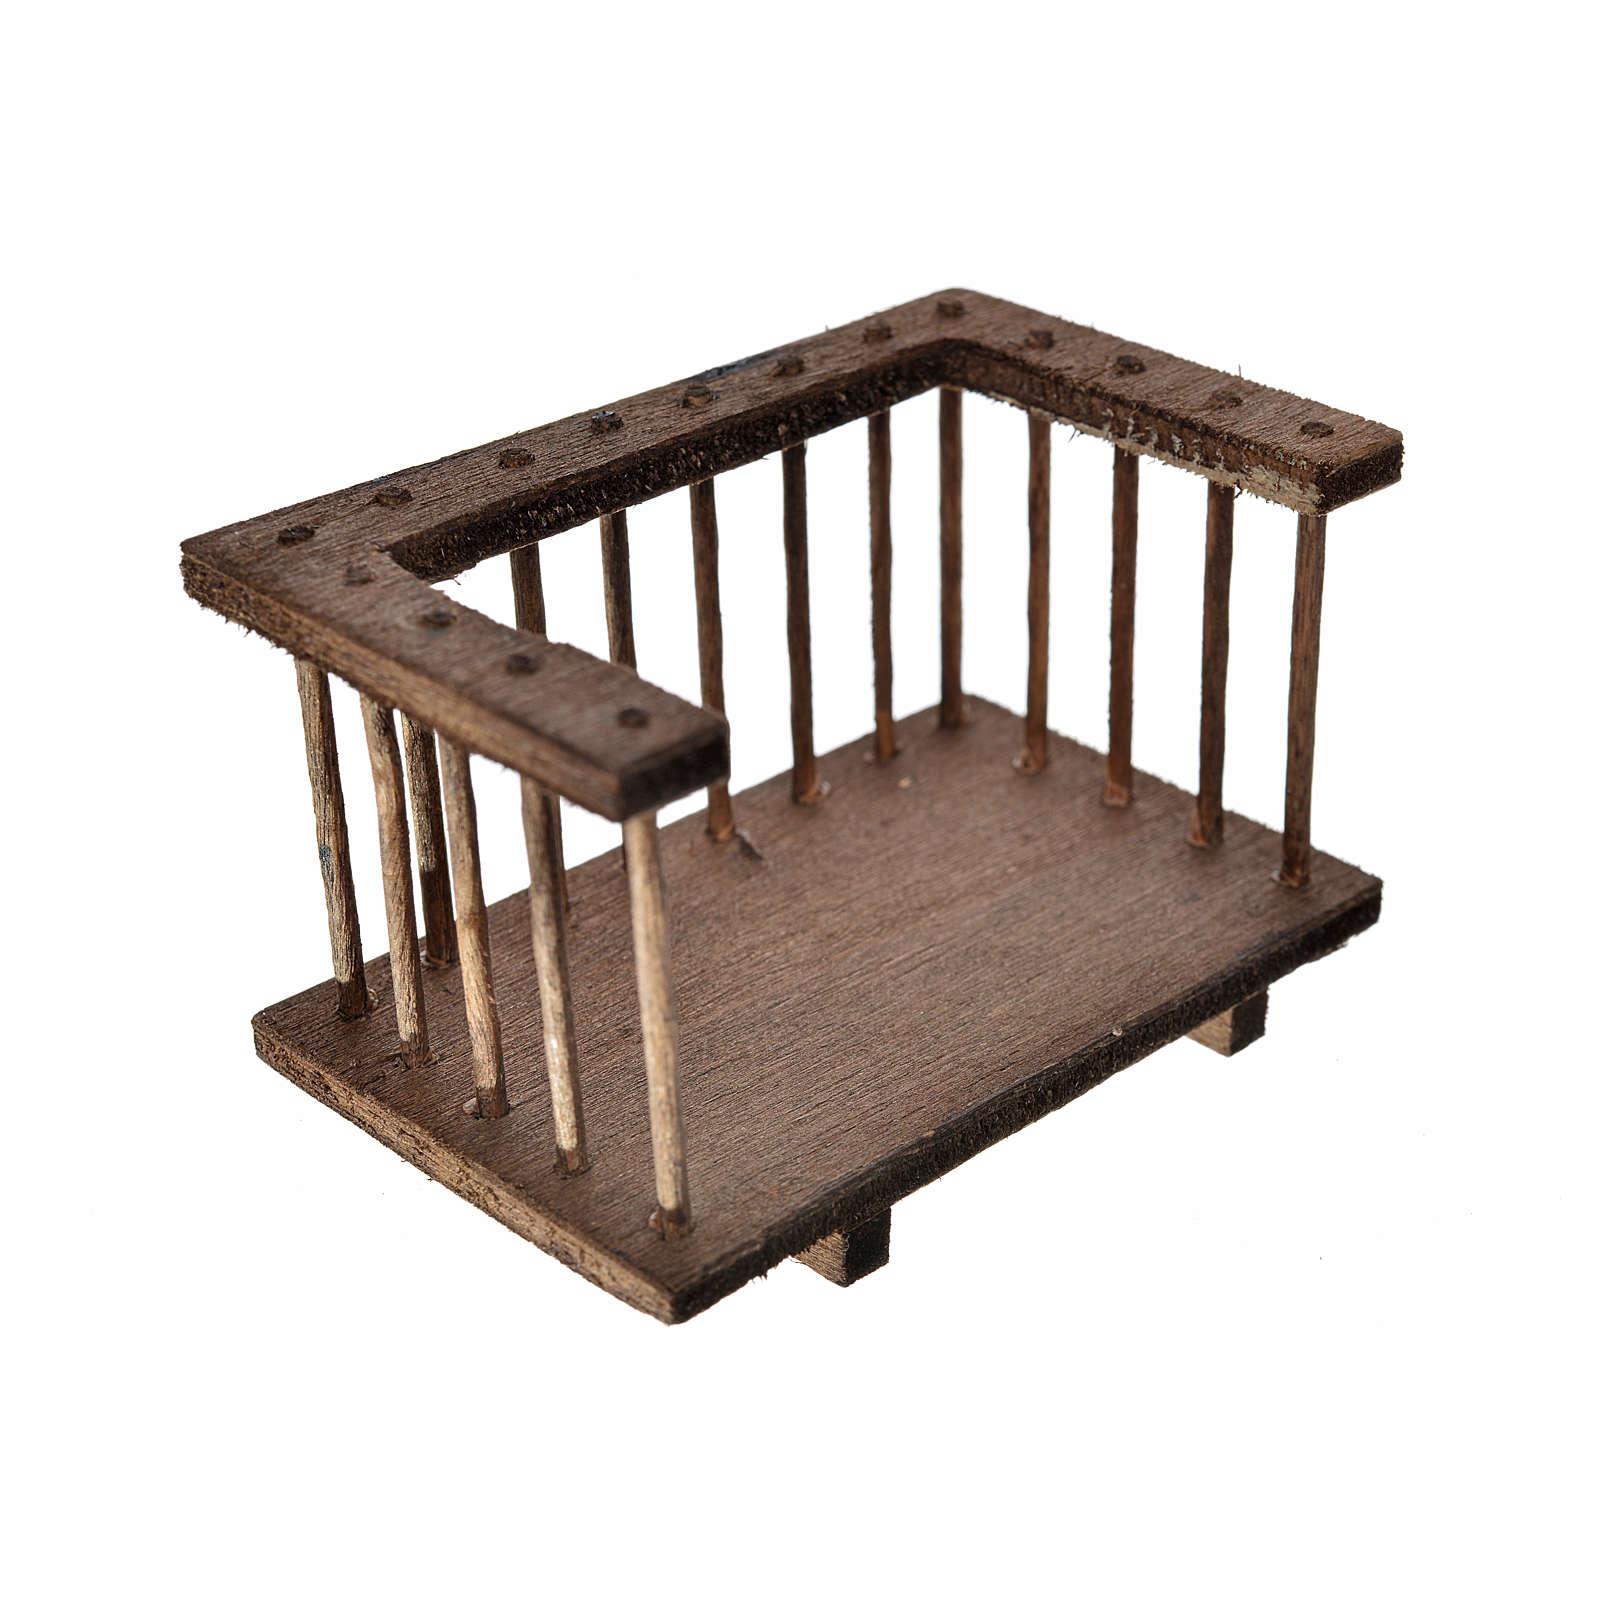 Nativity accessory, wooden balcony 7x3.5x4cm 4